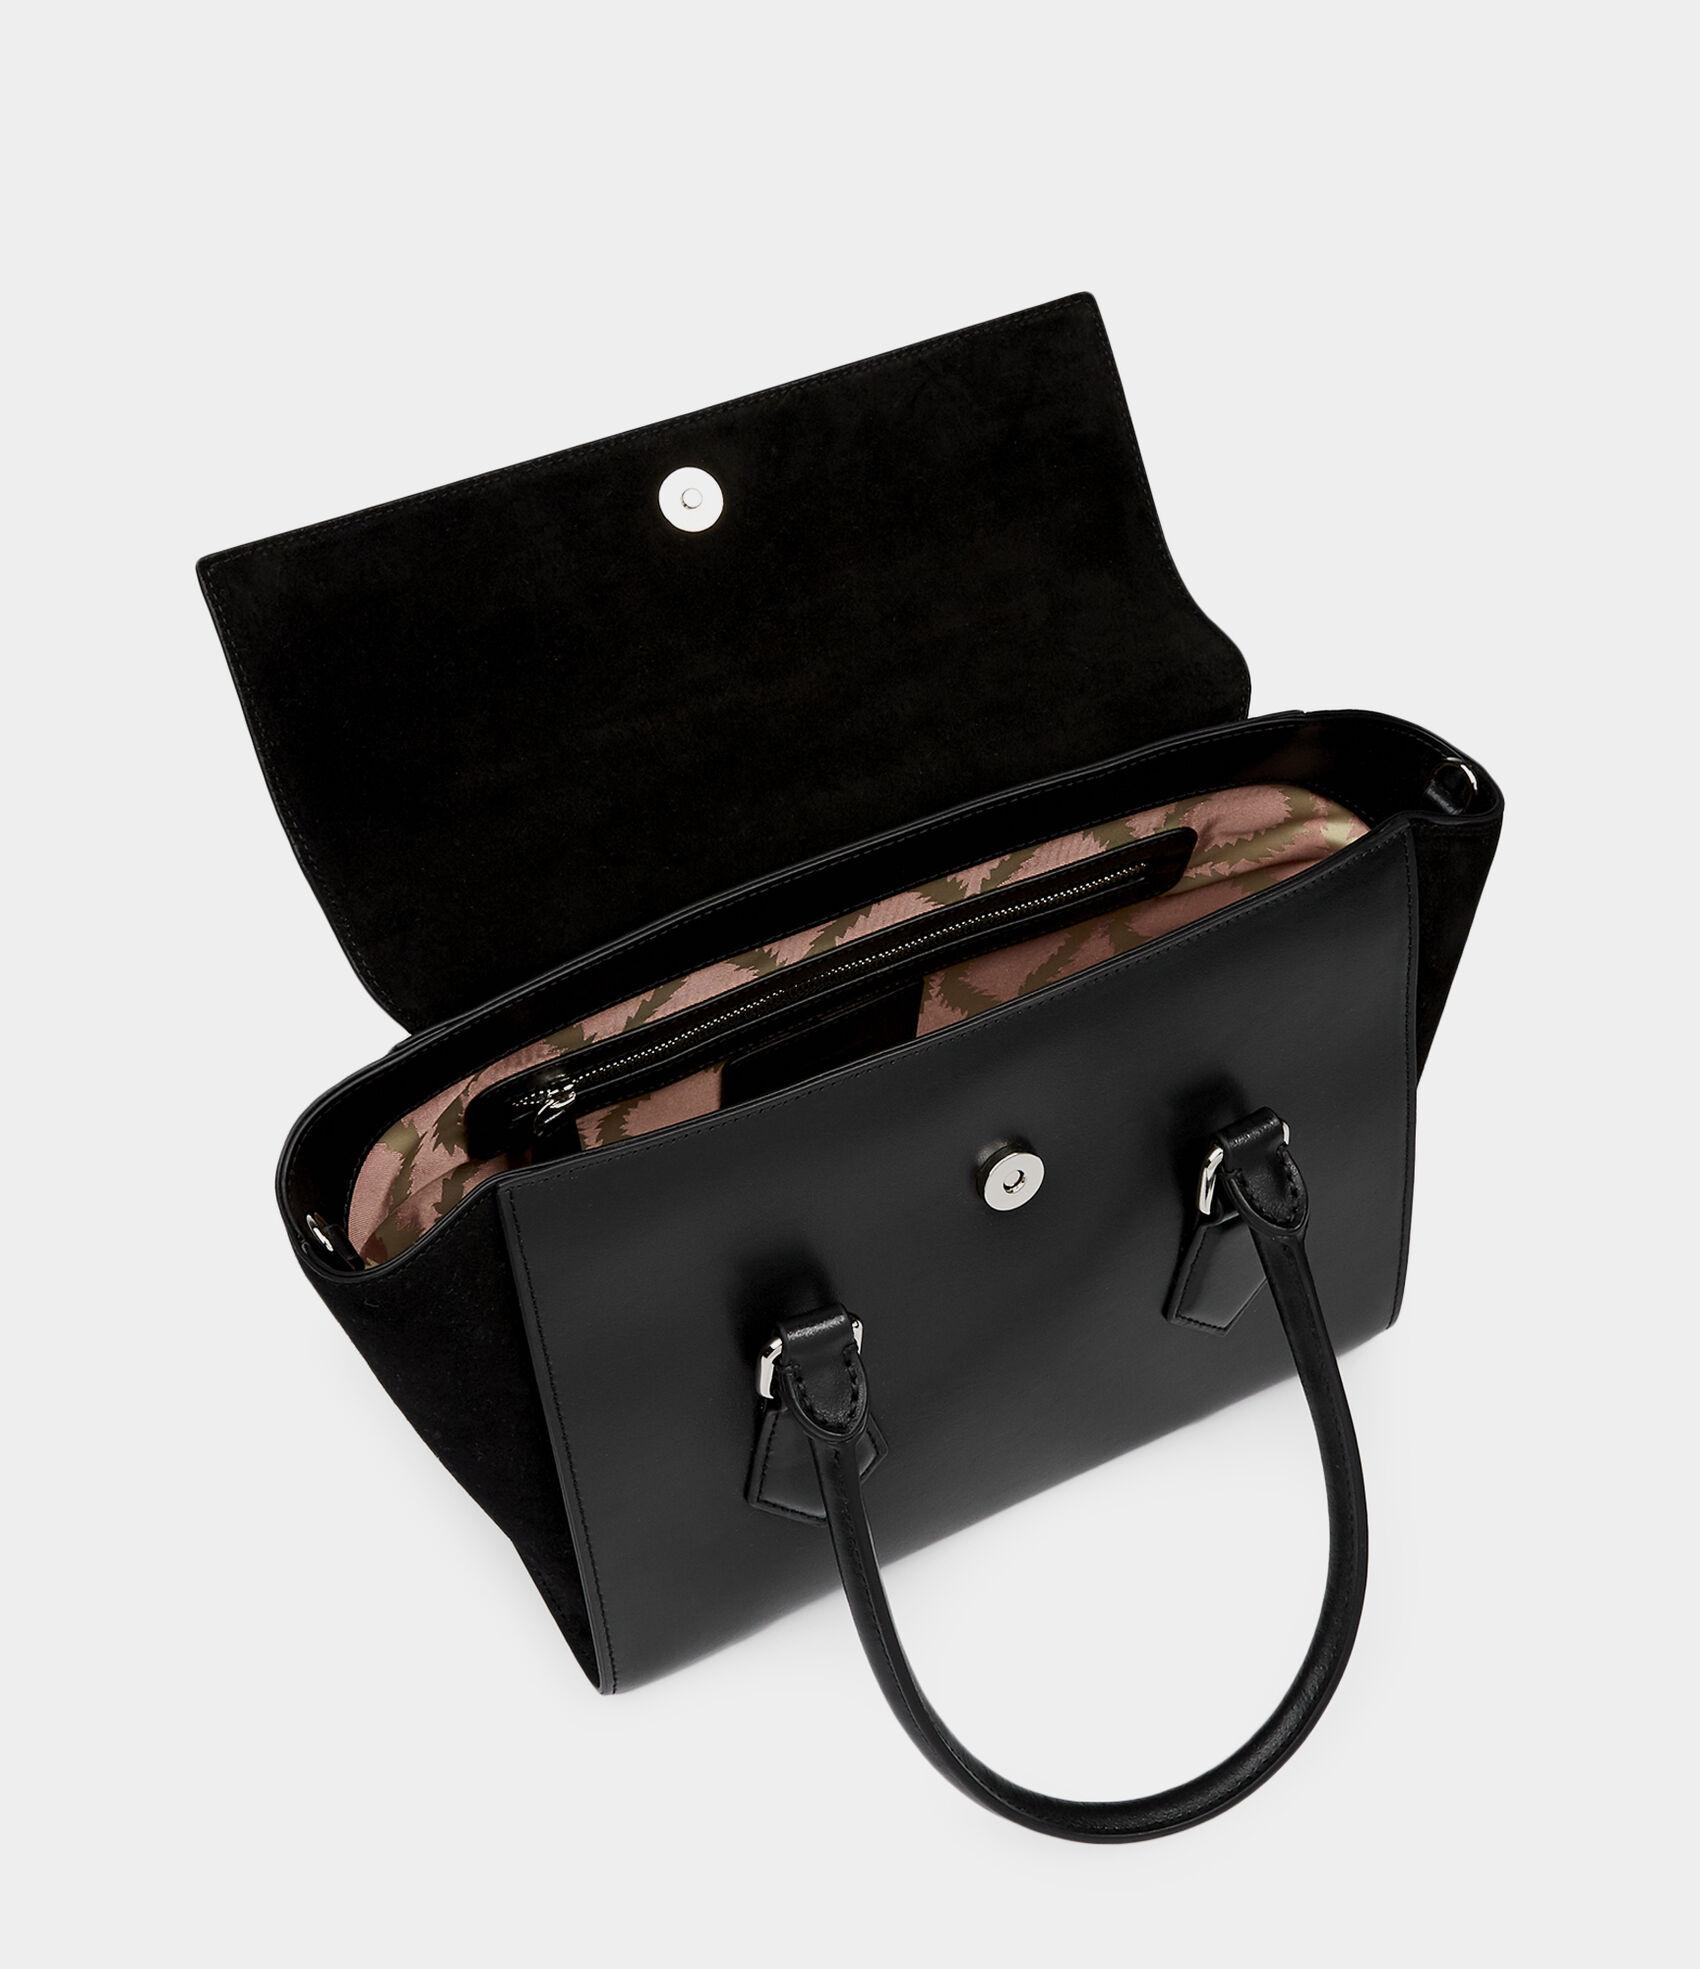 Vivienne Westwood Women s Designer Handbags  c1537101a5524